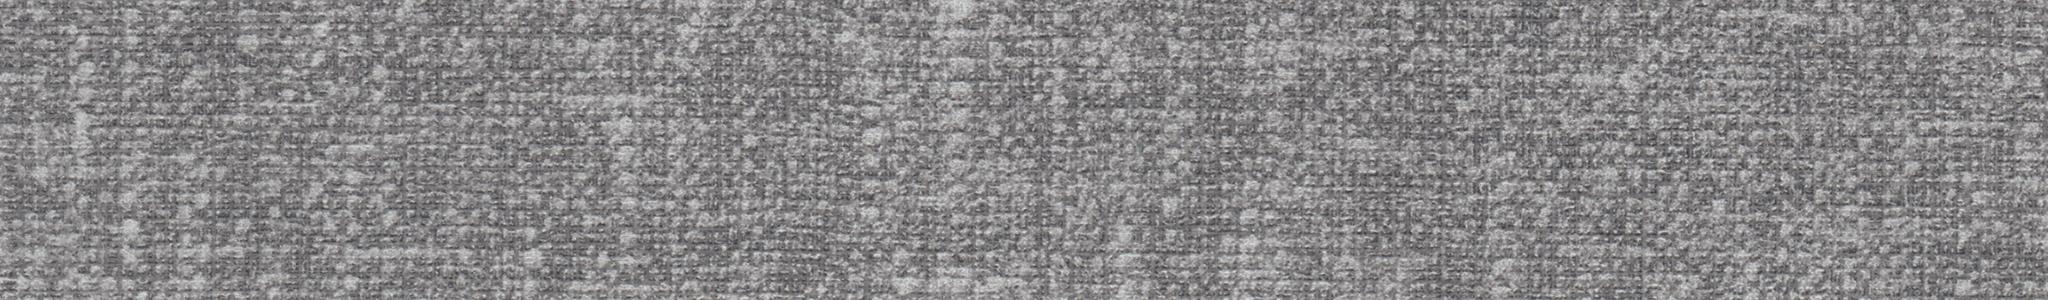 HD 295806 ABS Edge Fabric Graphite